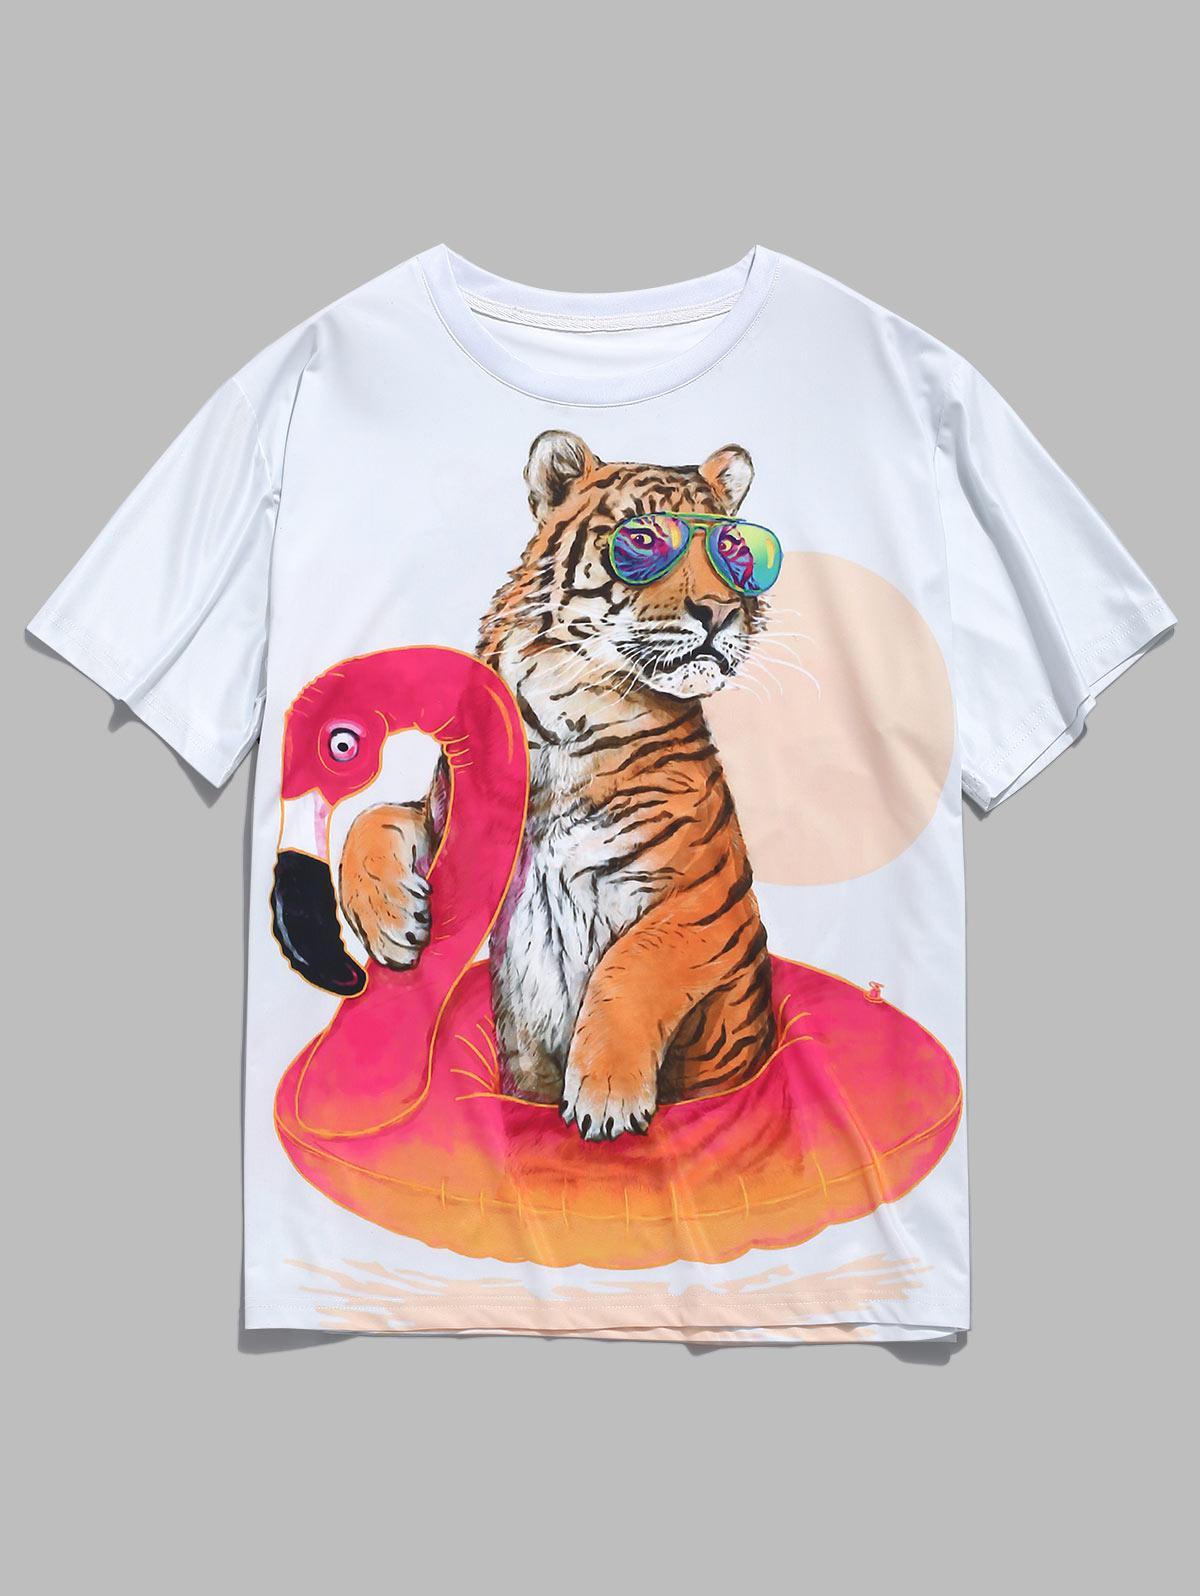 Tiger Animals Print Short Sleeves T-shirt